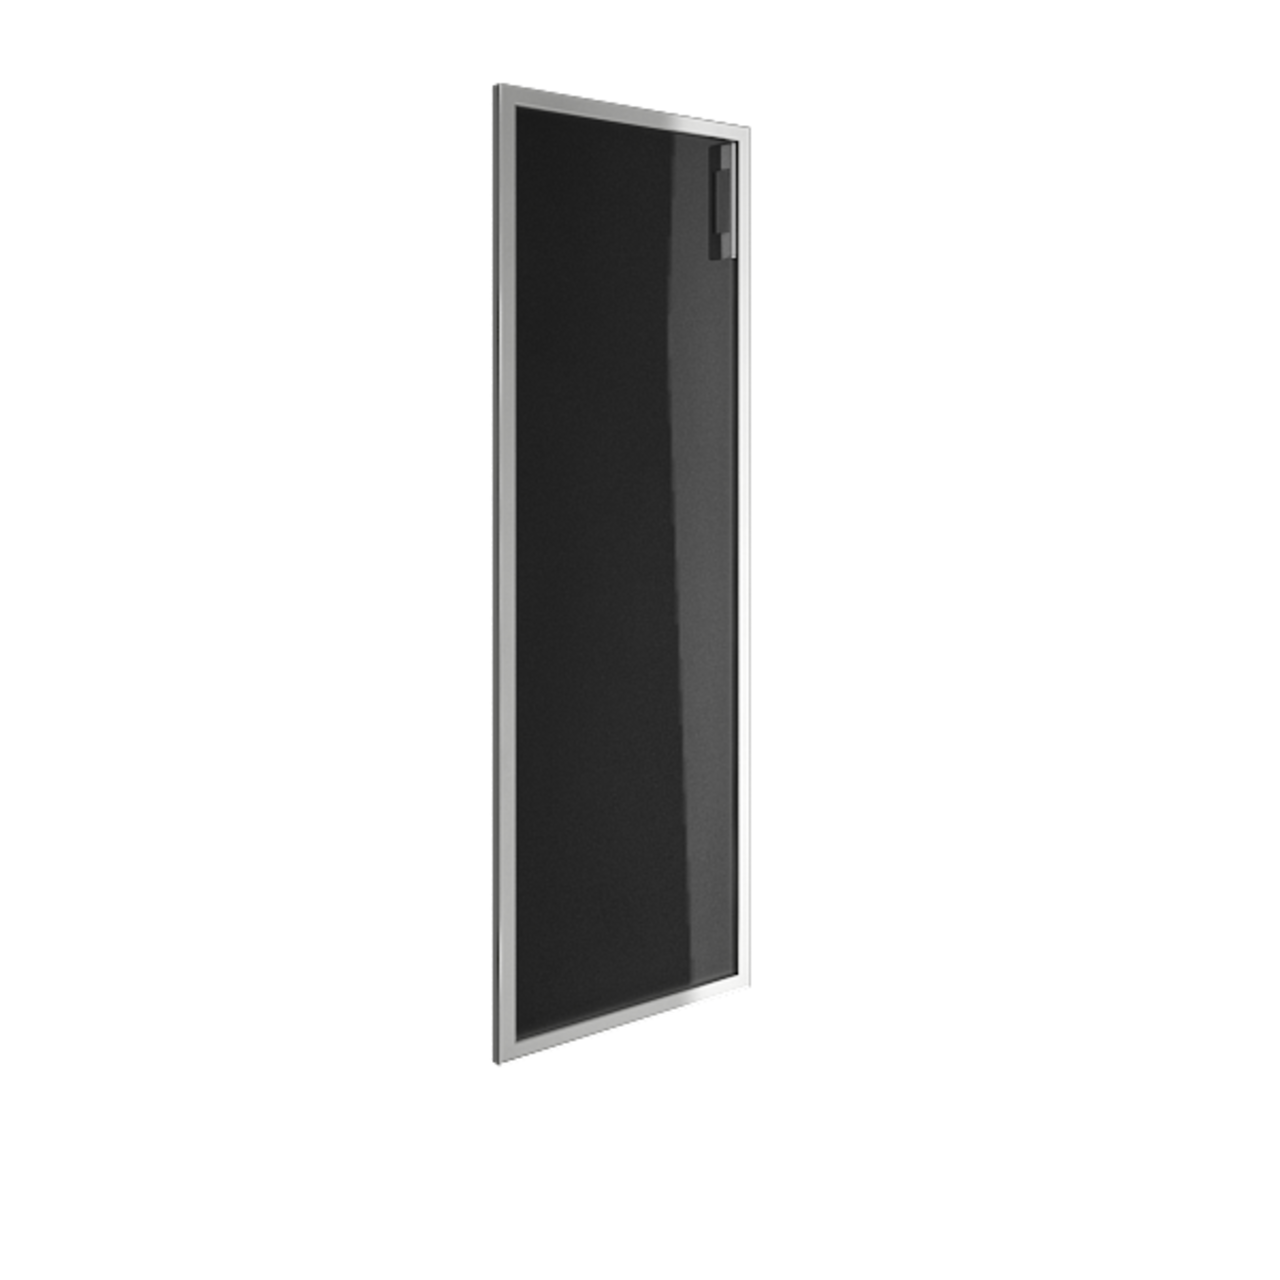 Дверь стекло в раме среднее Lacobel black левая - фото 5